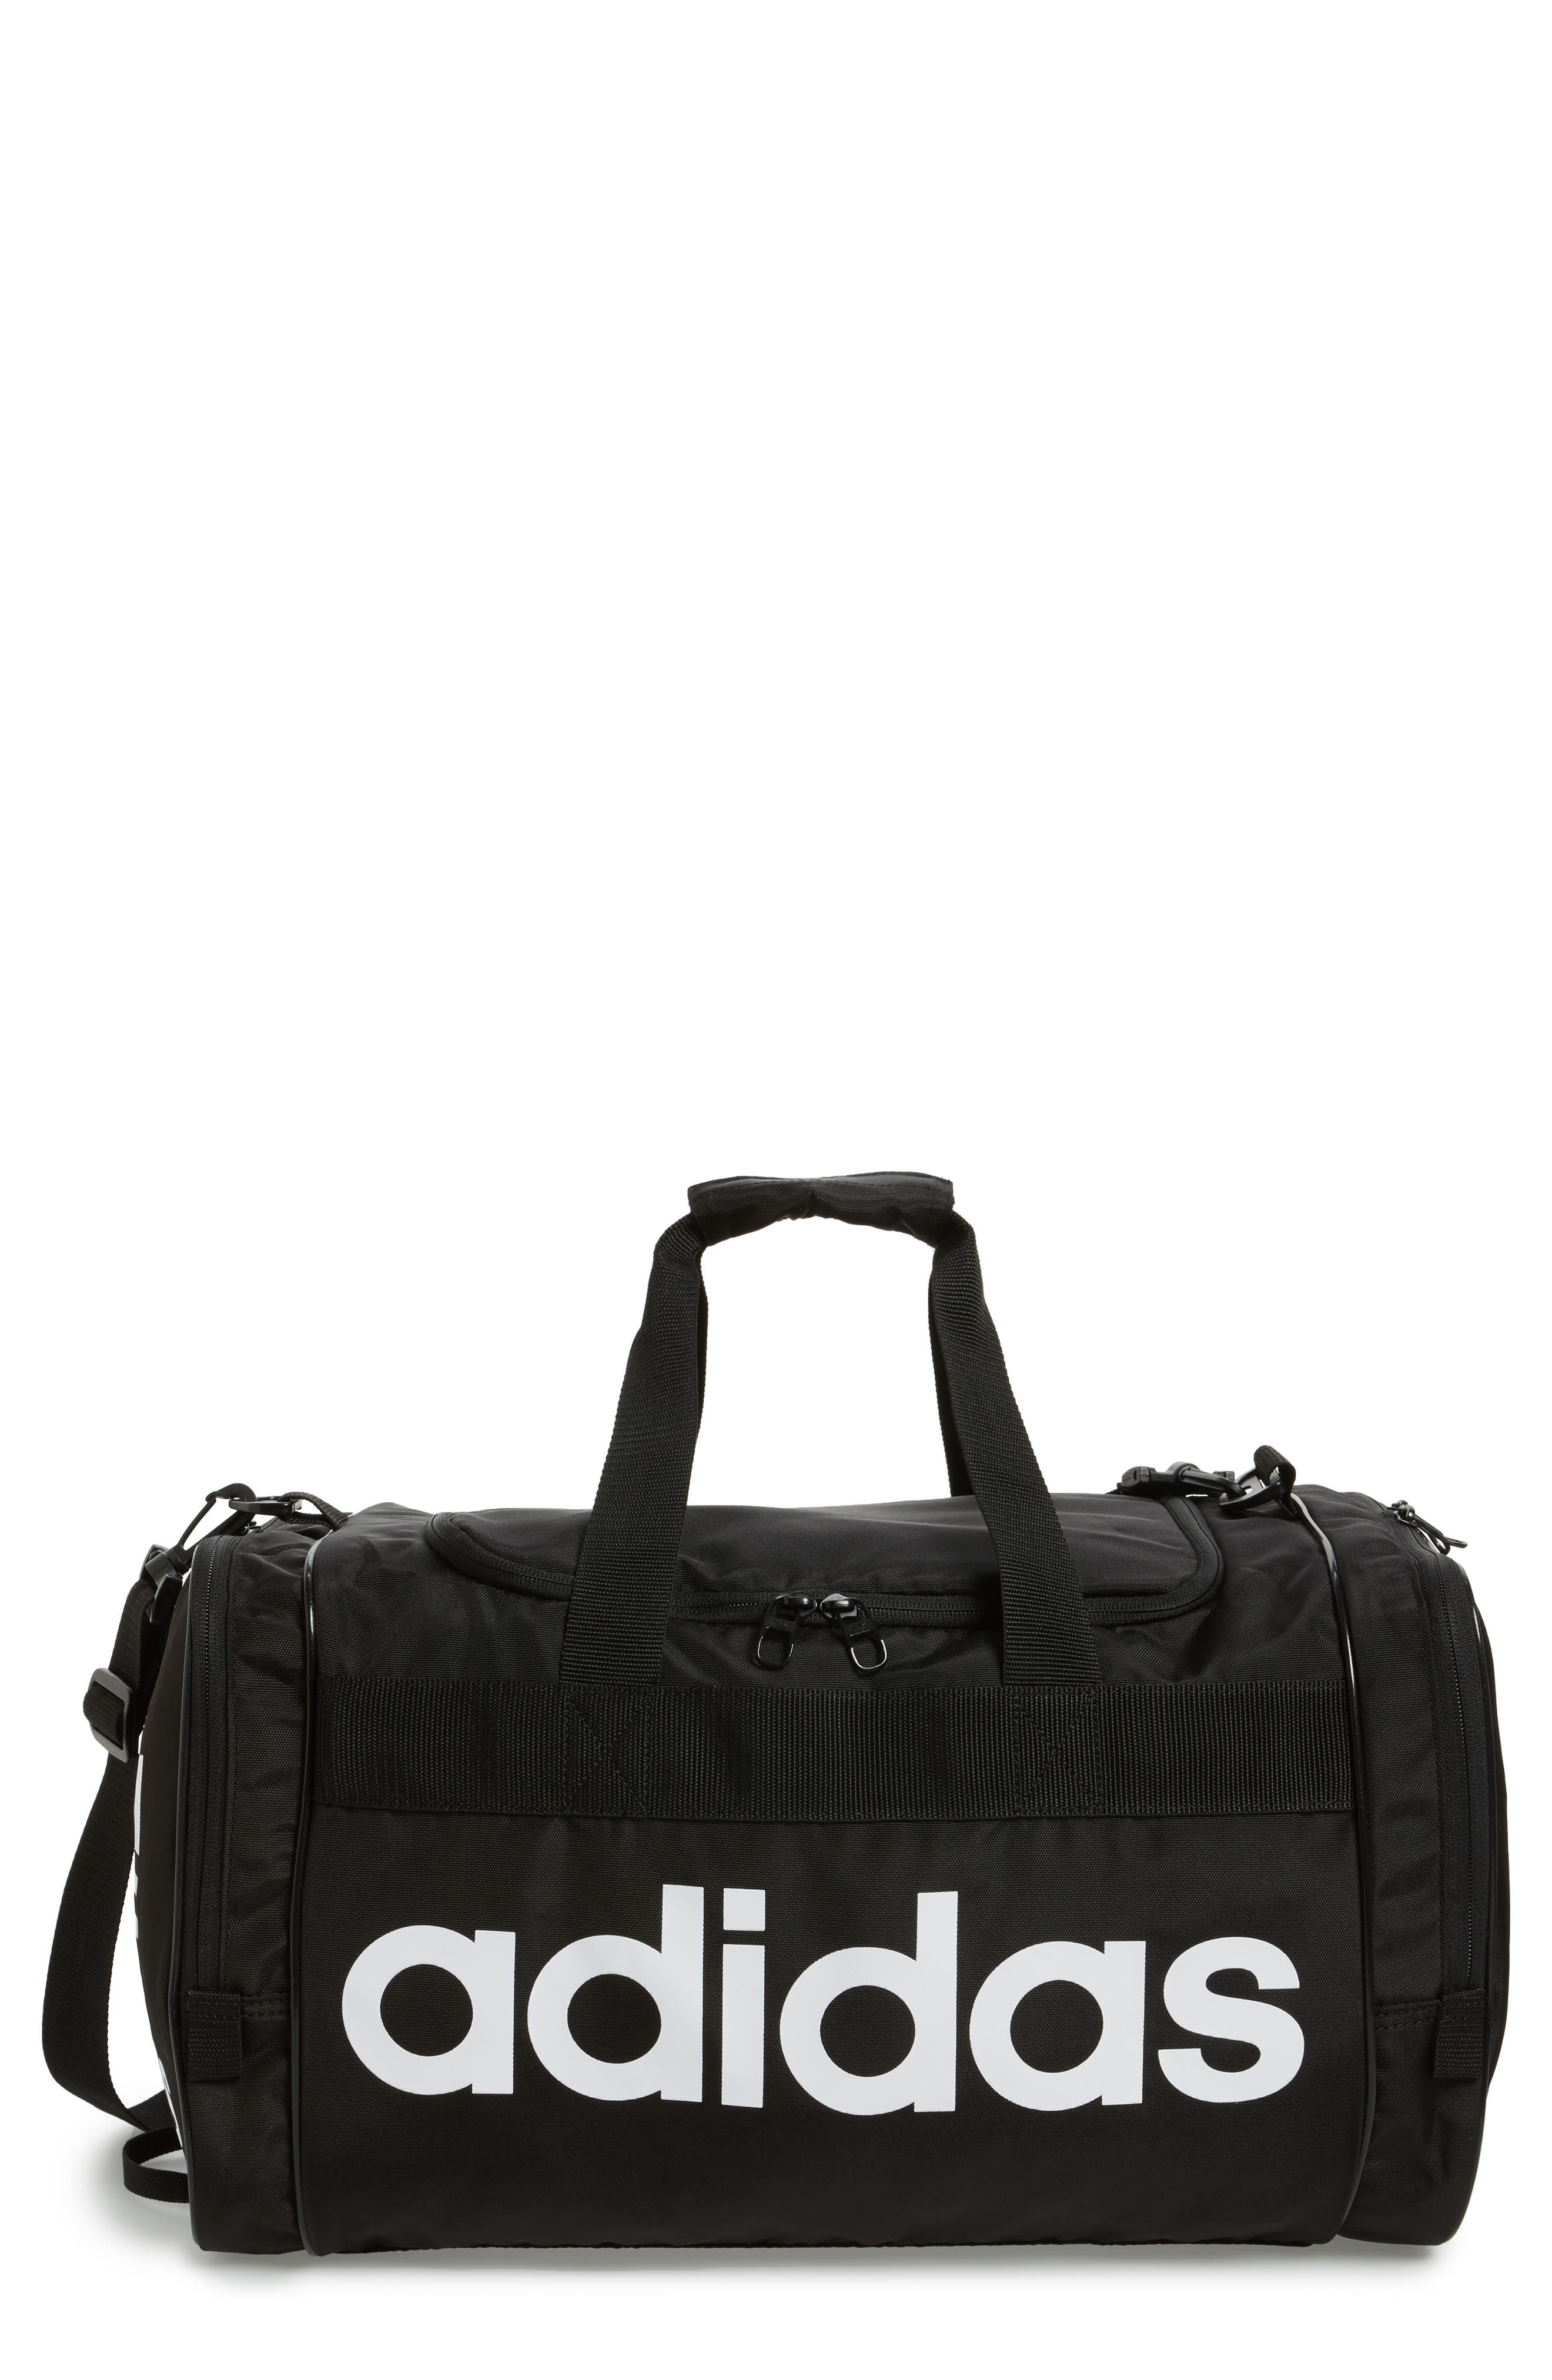 ADIDAS ORIGINALS,                             Santiago Duffel Bag,                             Main thumbnail 1, color,                             BLACK/ WHITE